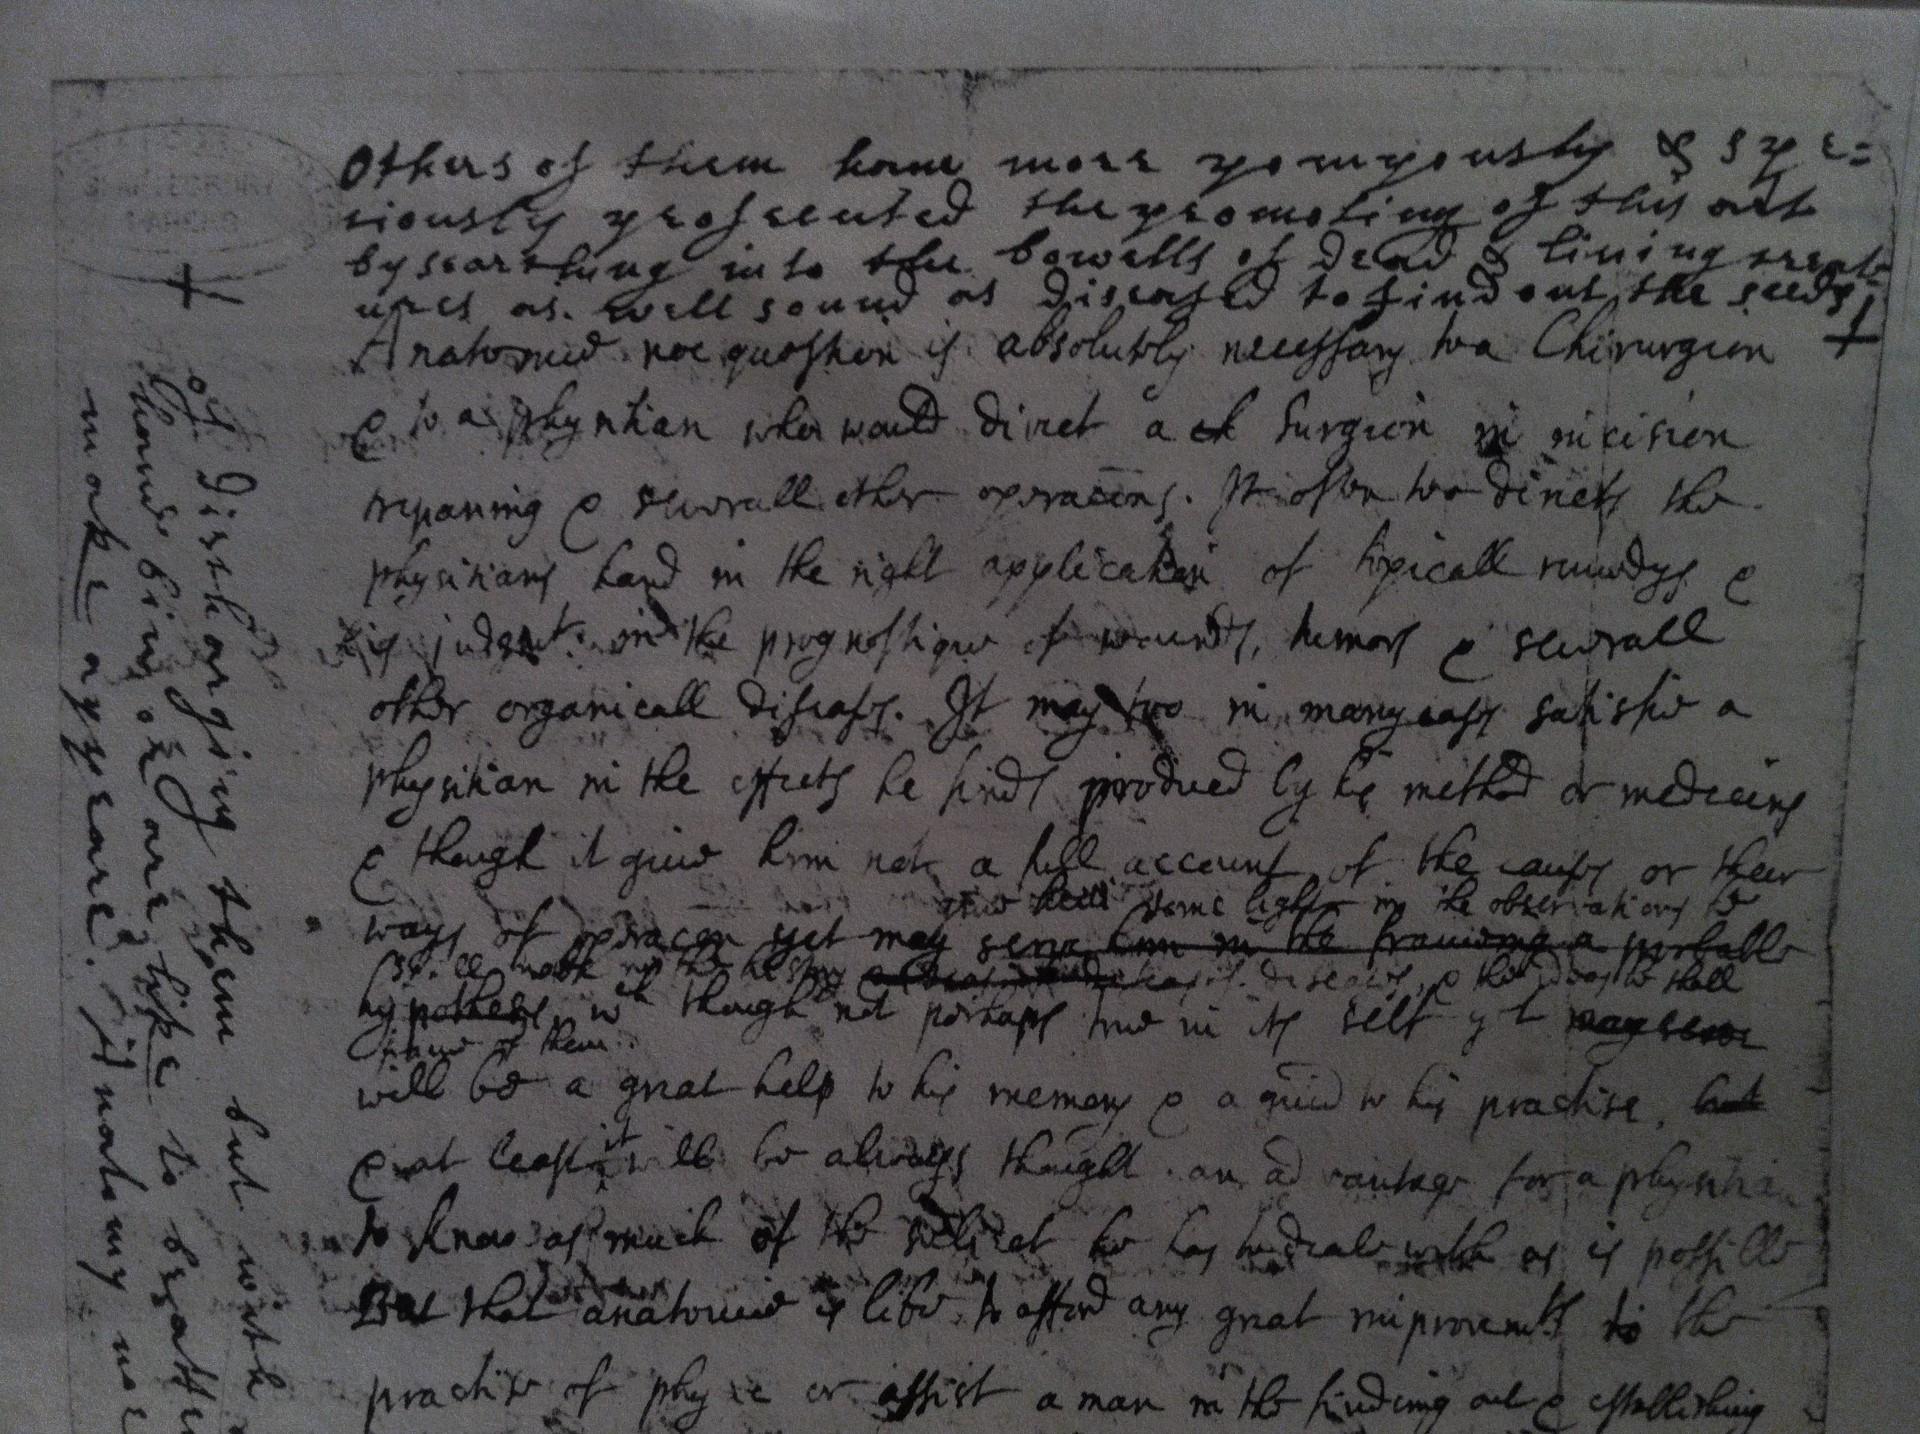 John Lockes Anatomia And De Arte Medica New Transcriptions